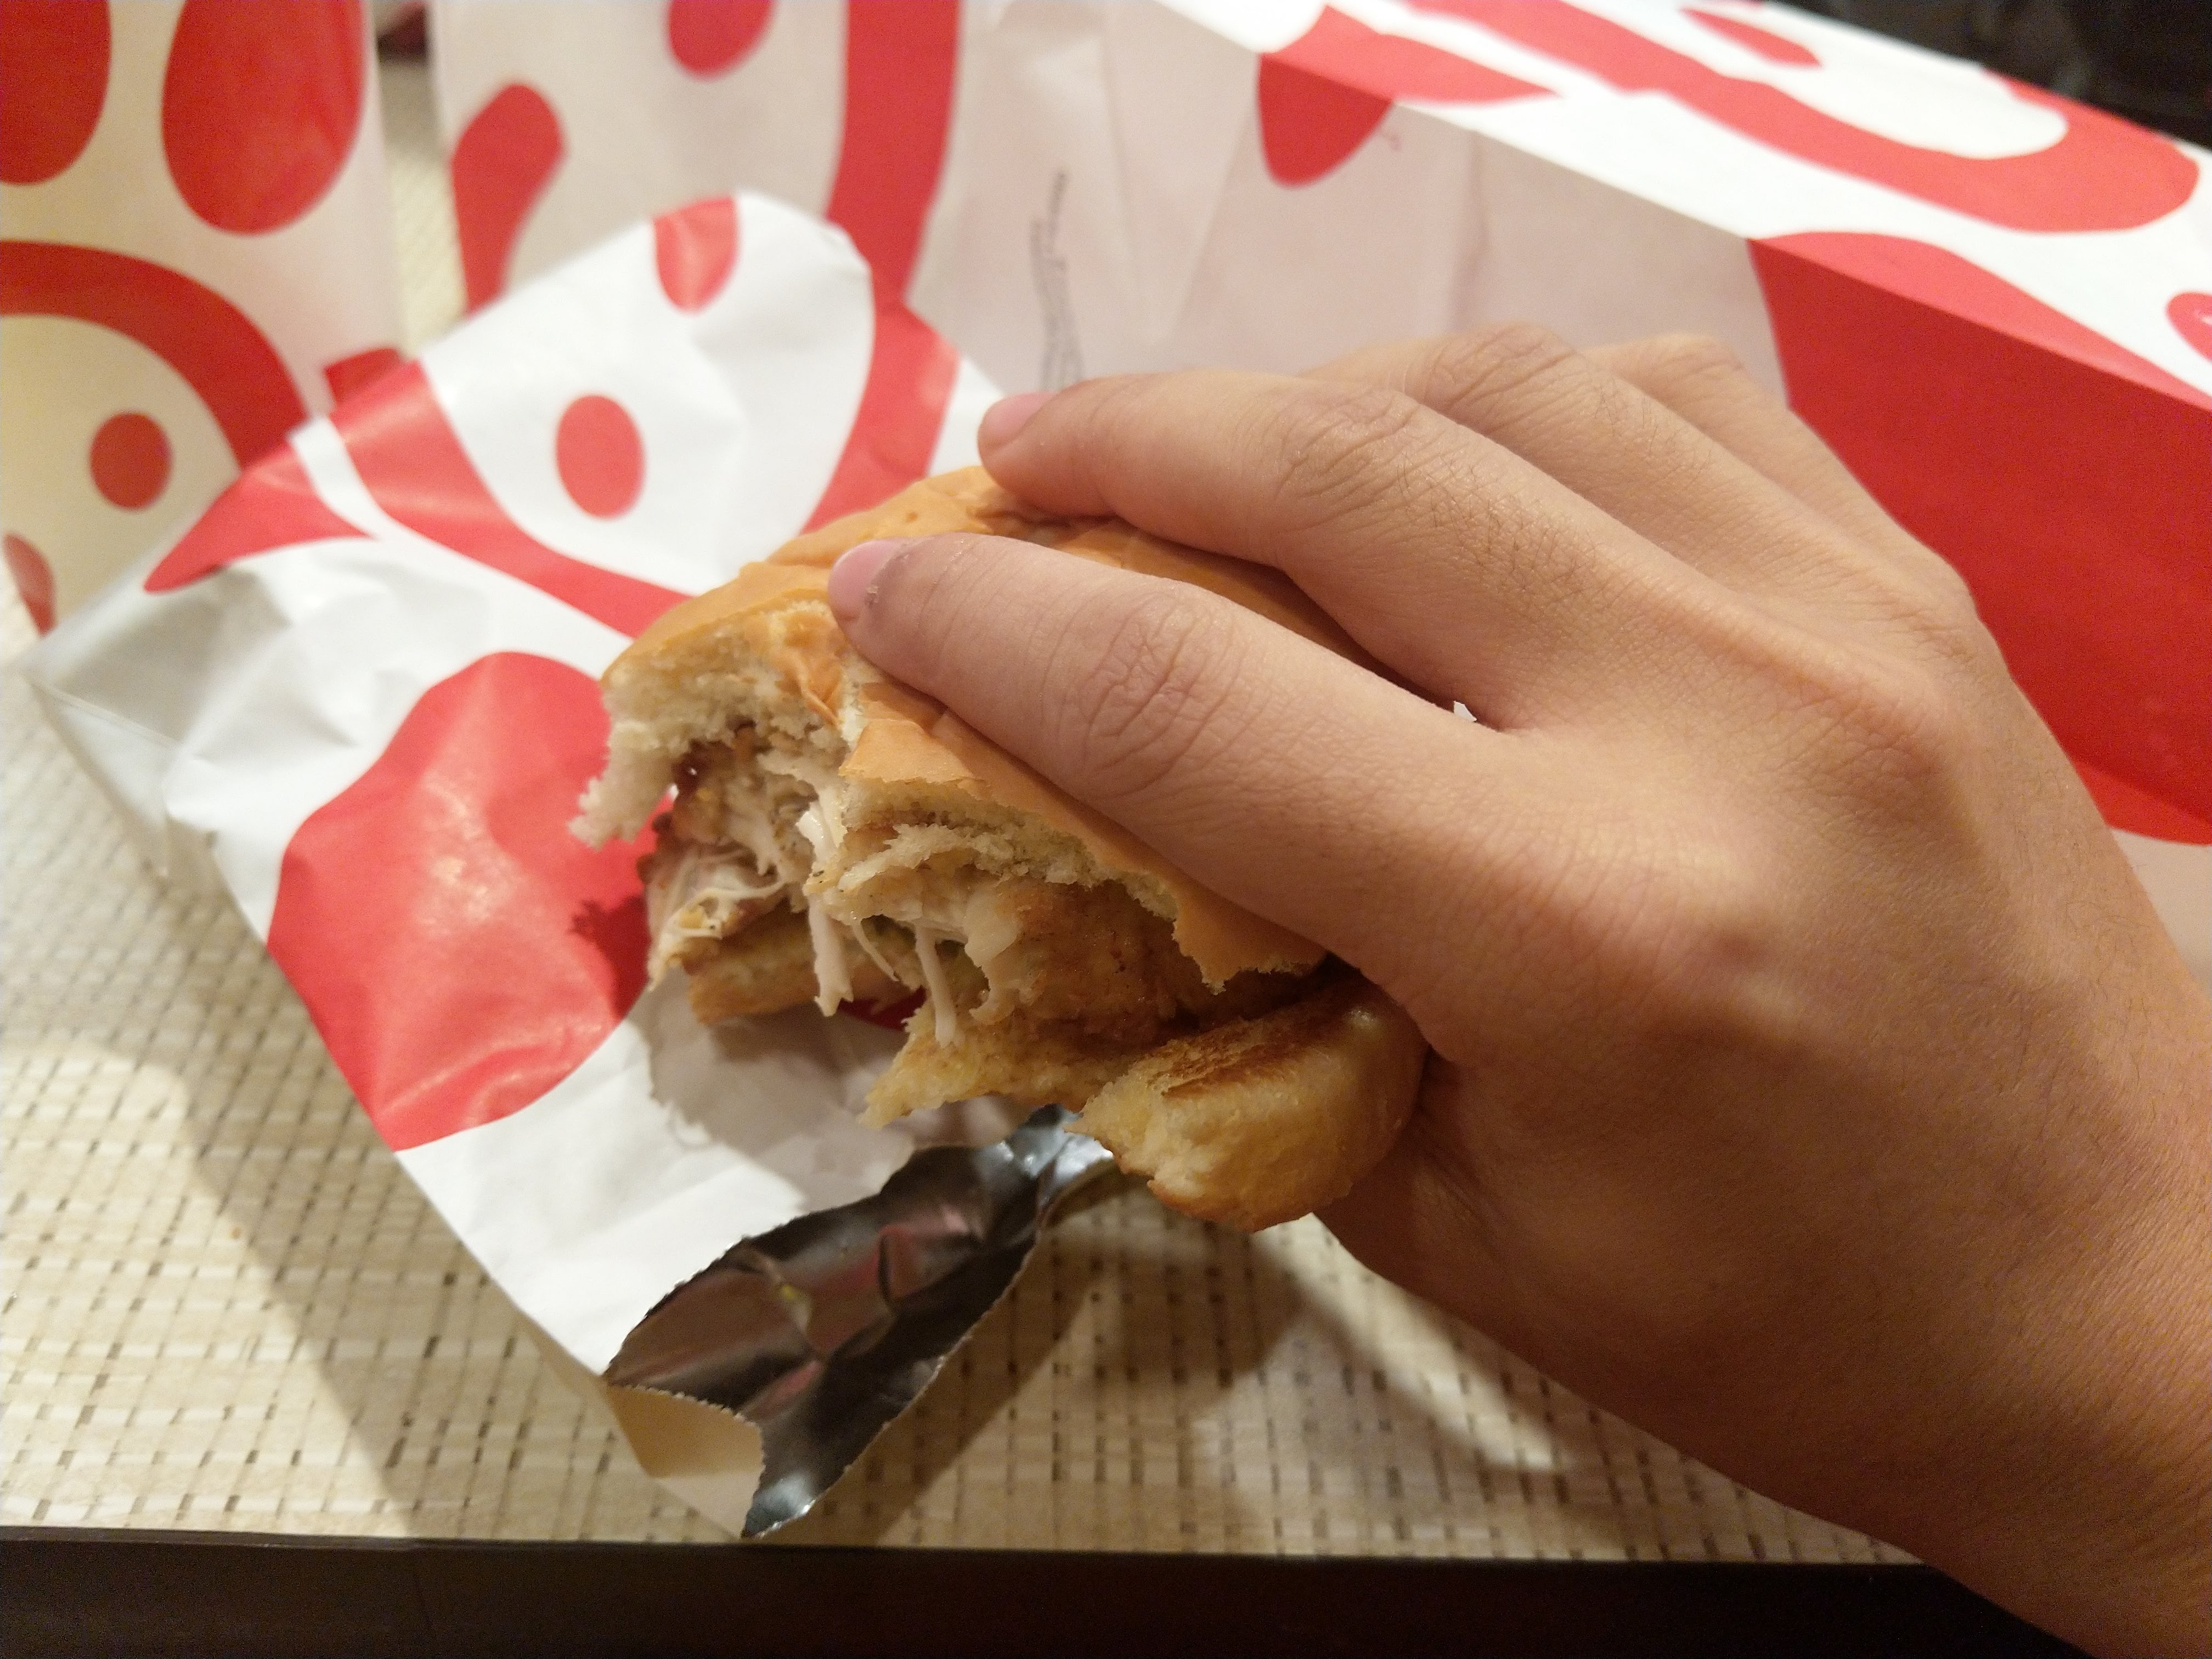 a half-finished chick fil a sandwich